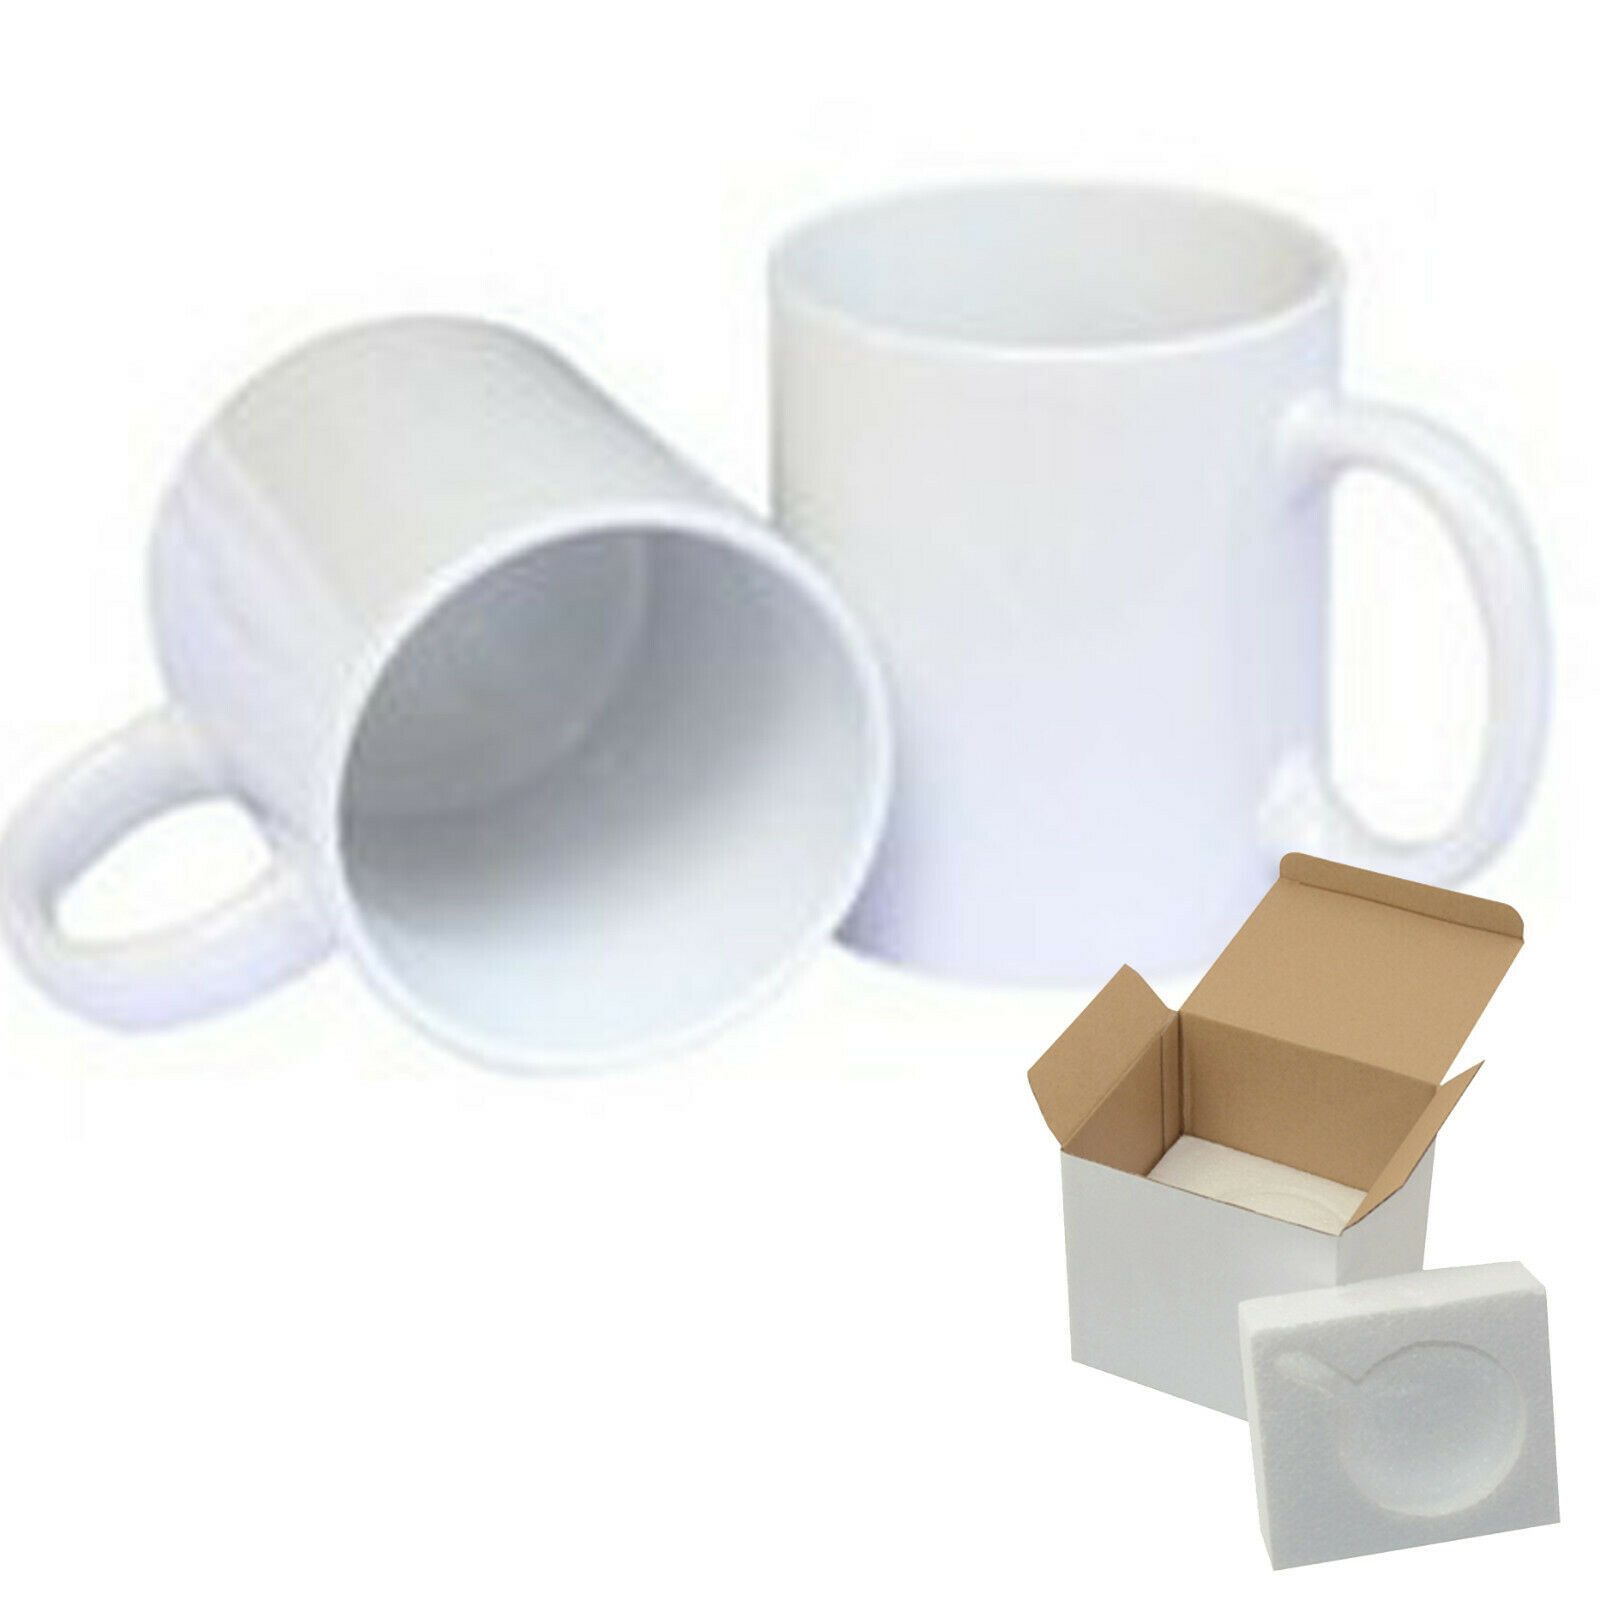 12 PCS AAA 15oz blank Weiß sublimation mug With Foam Supports Cardboard Box